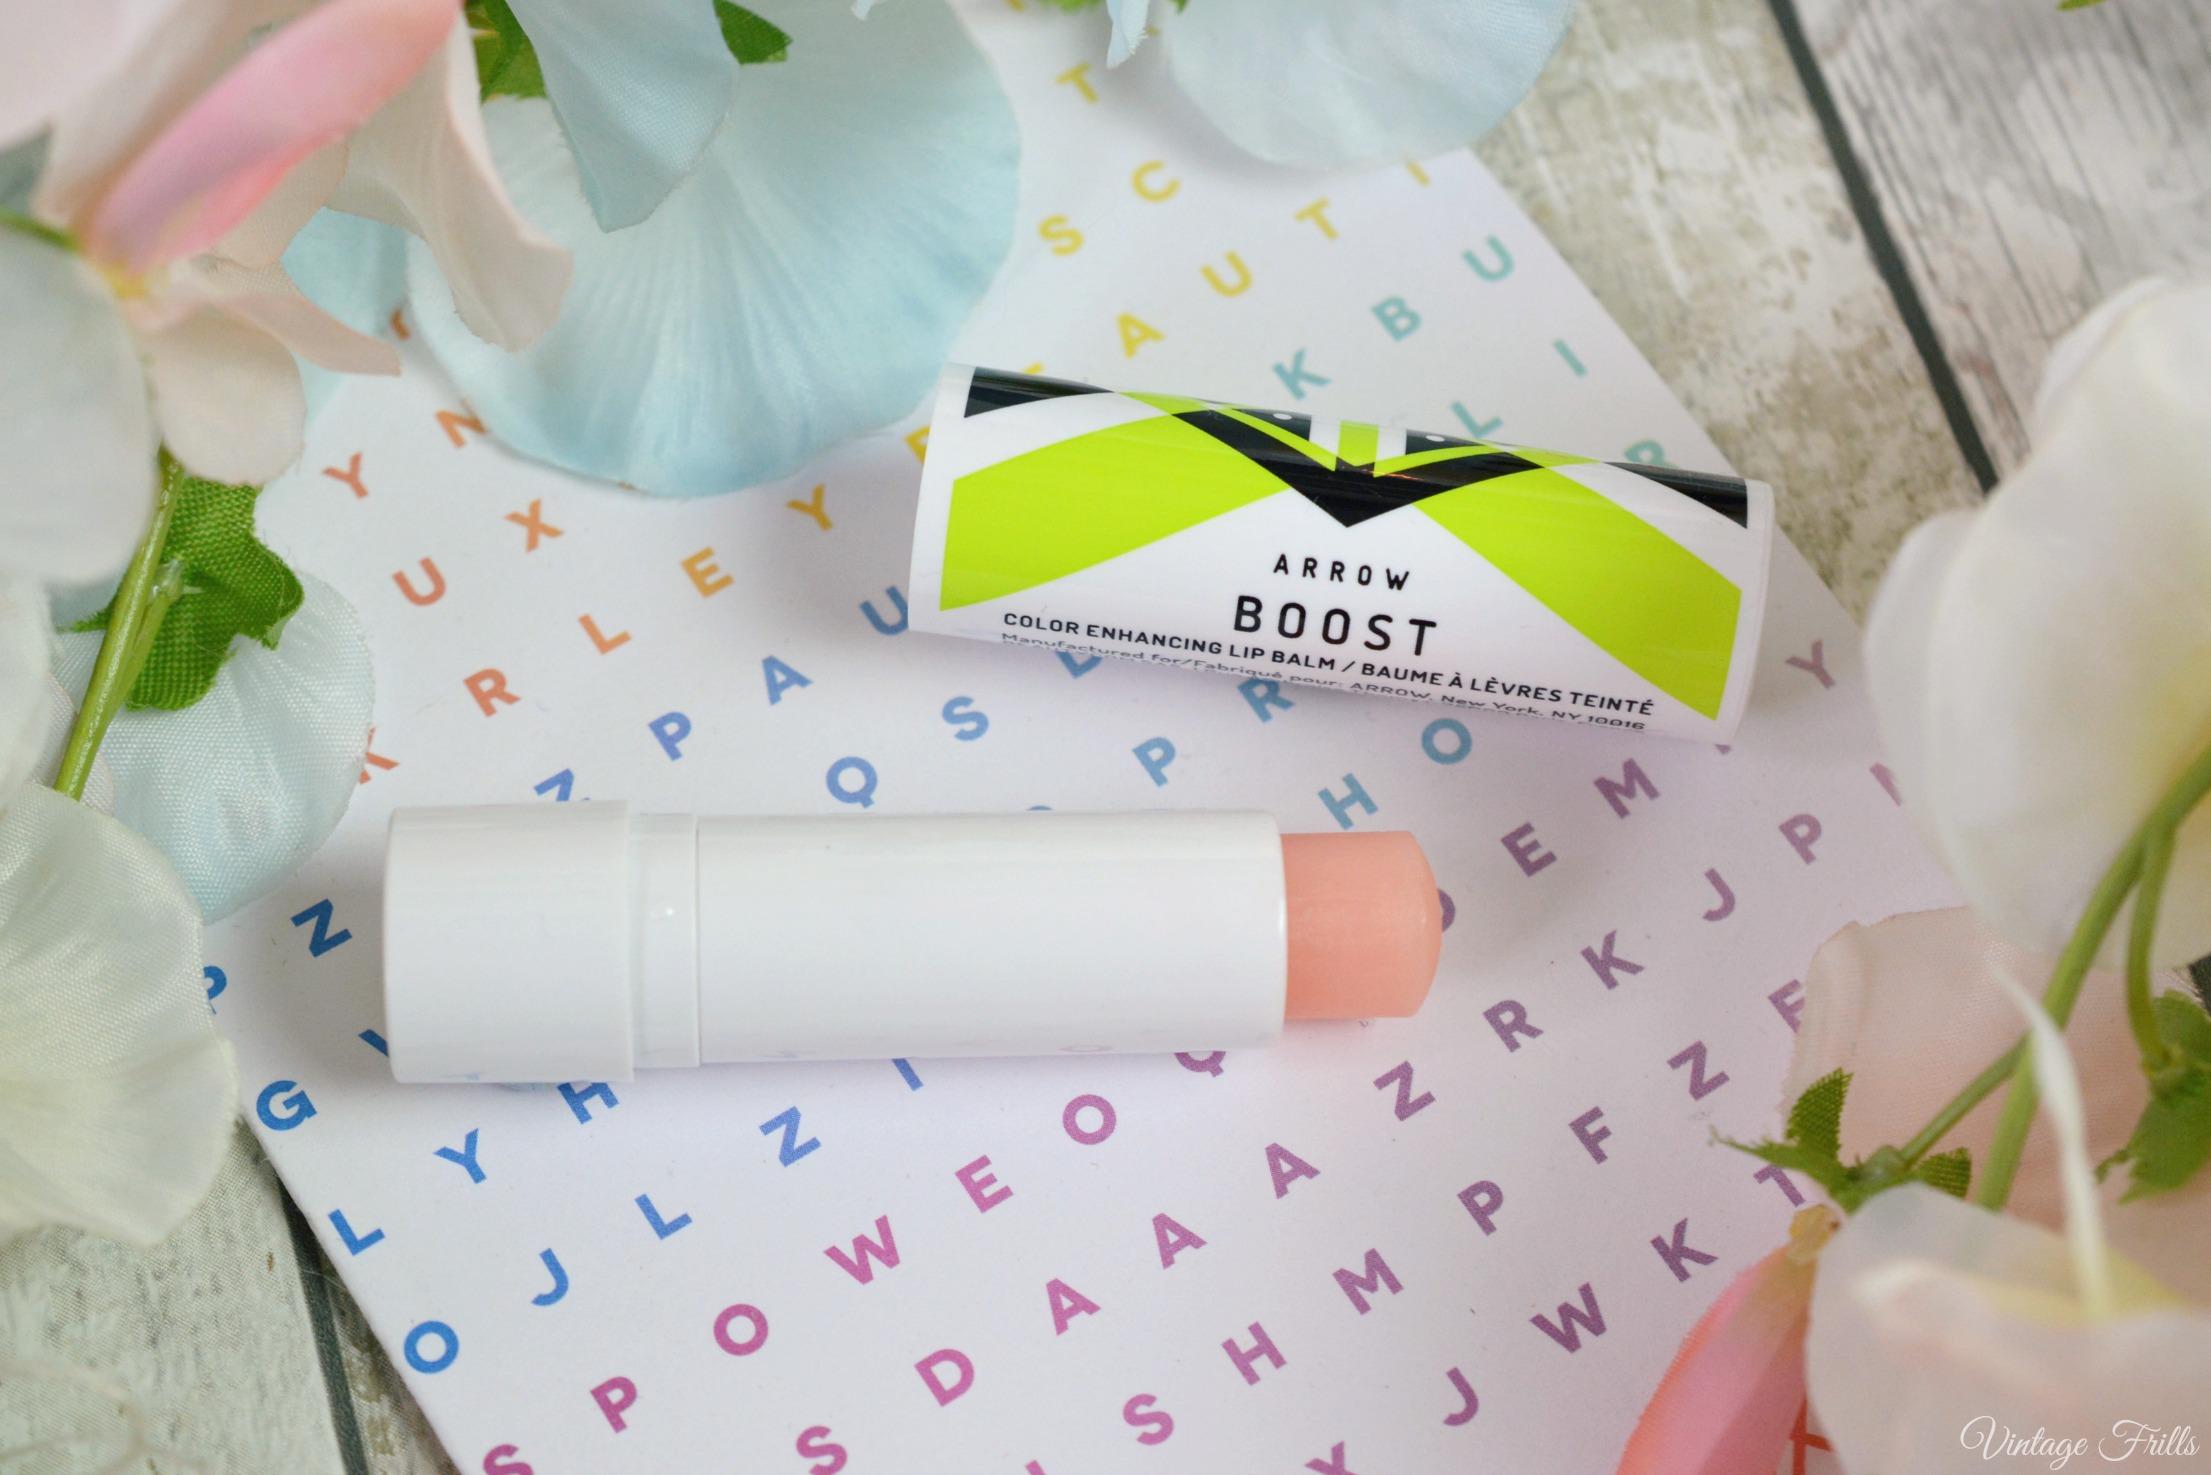 March Birchbox Arrow Boost Colour Enhancing Lip Balm